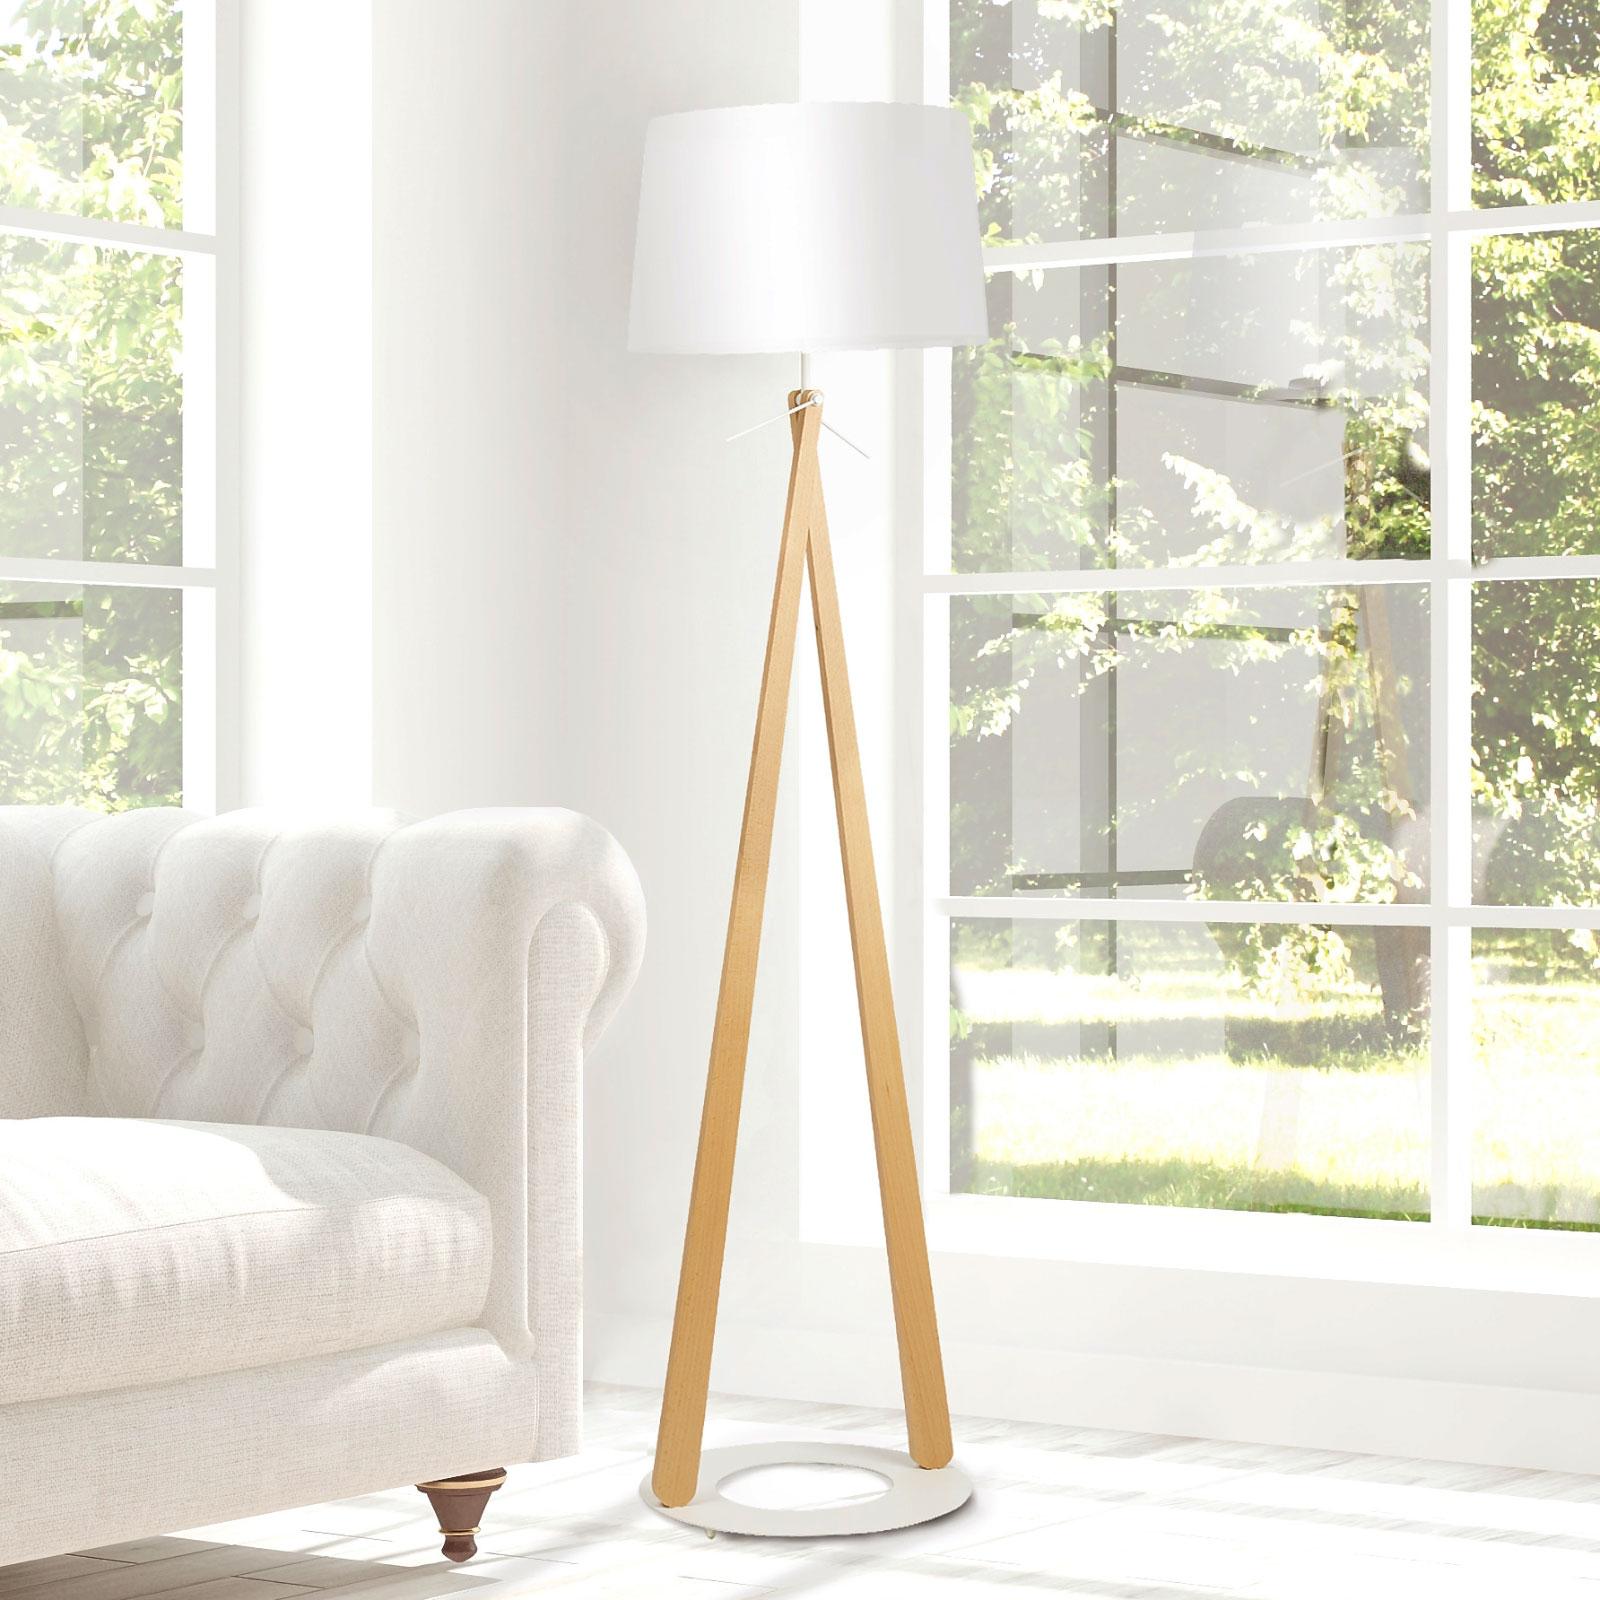 Vloerlamp Zazou LS, textiel-kap, witte lamphouder